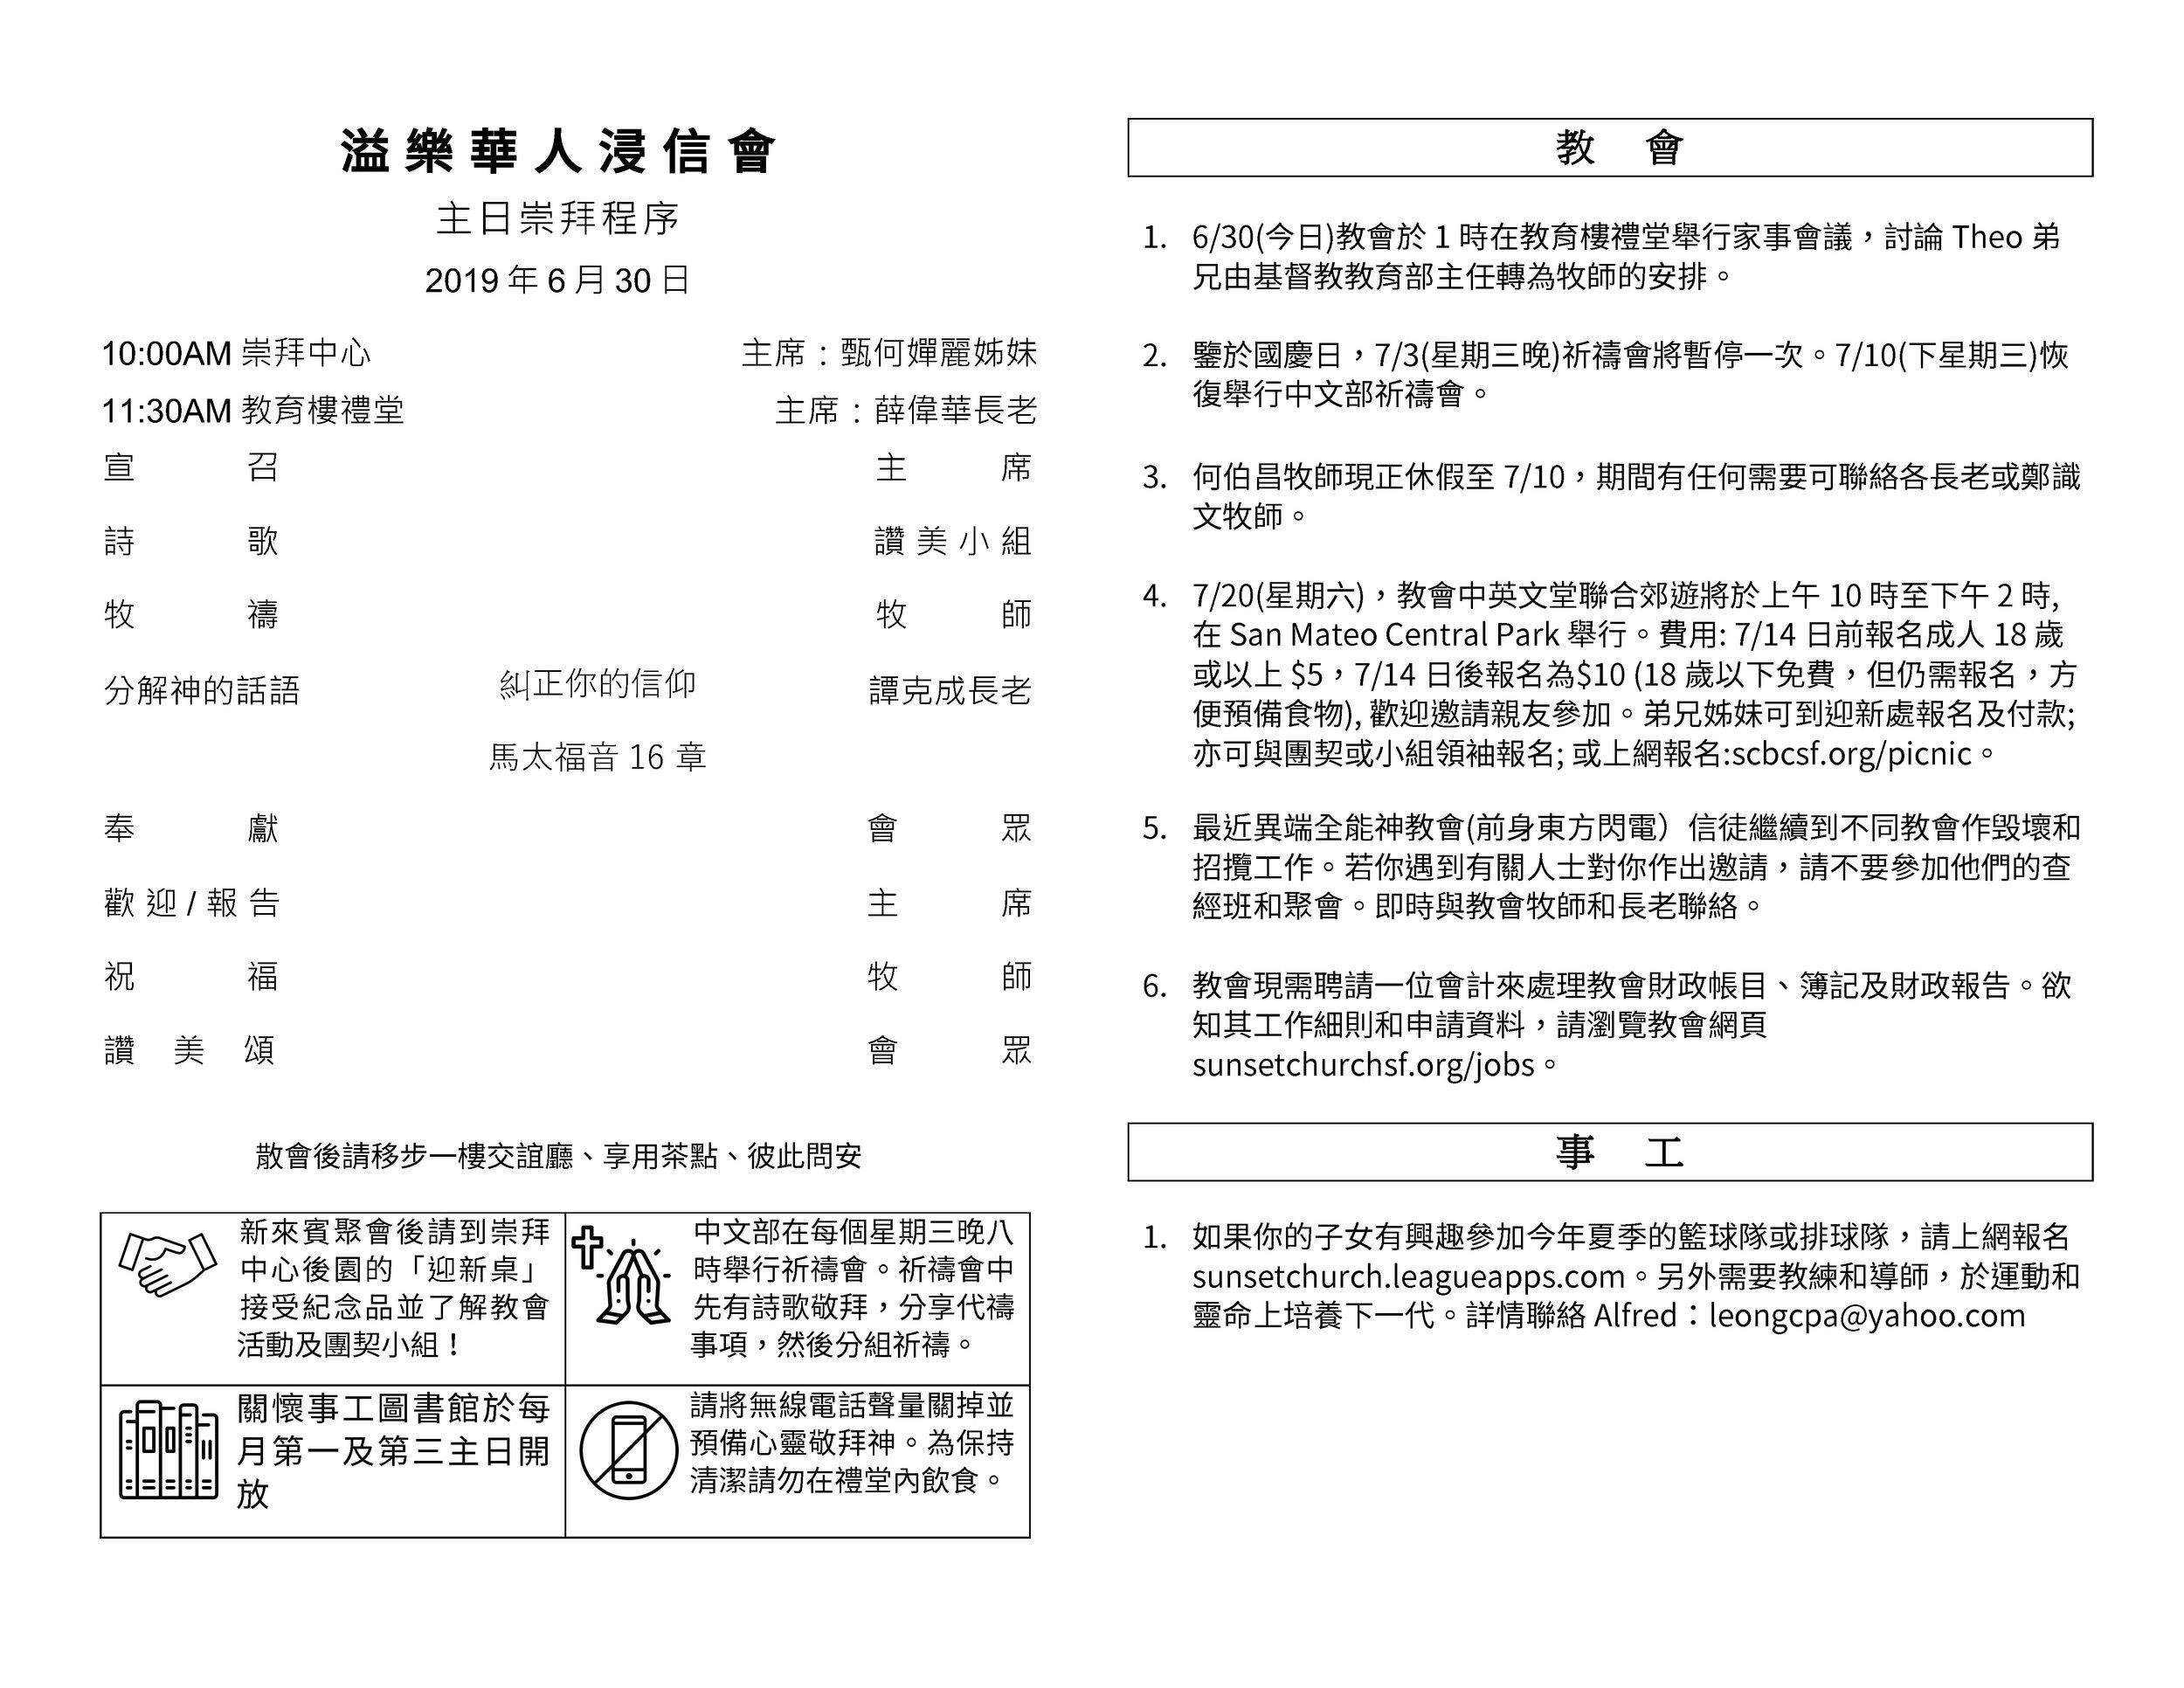 Chinese Bulletin 2019-6-30_Page_2.jpg